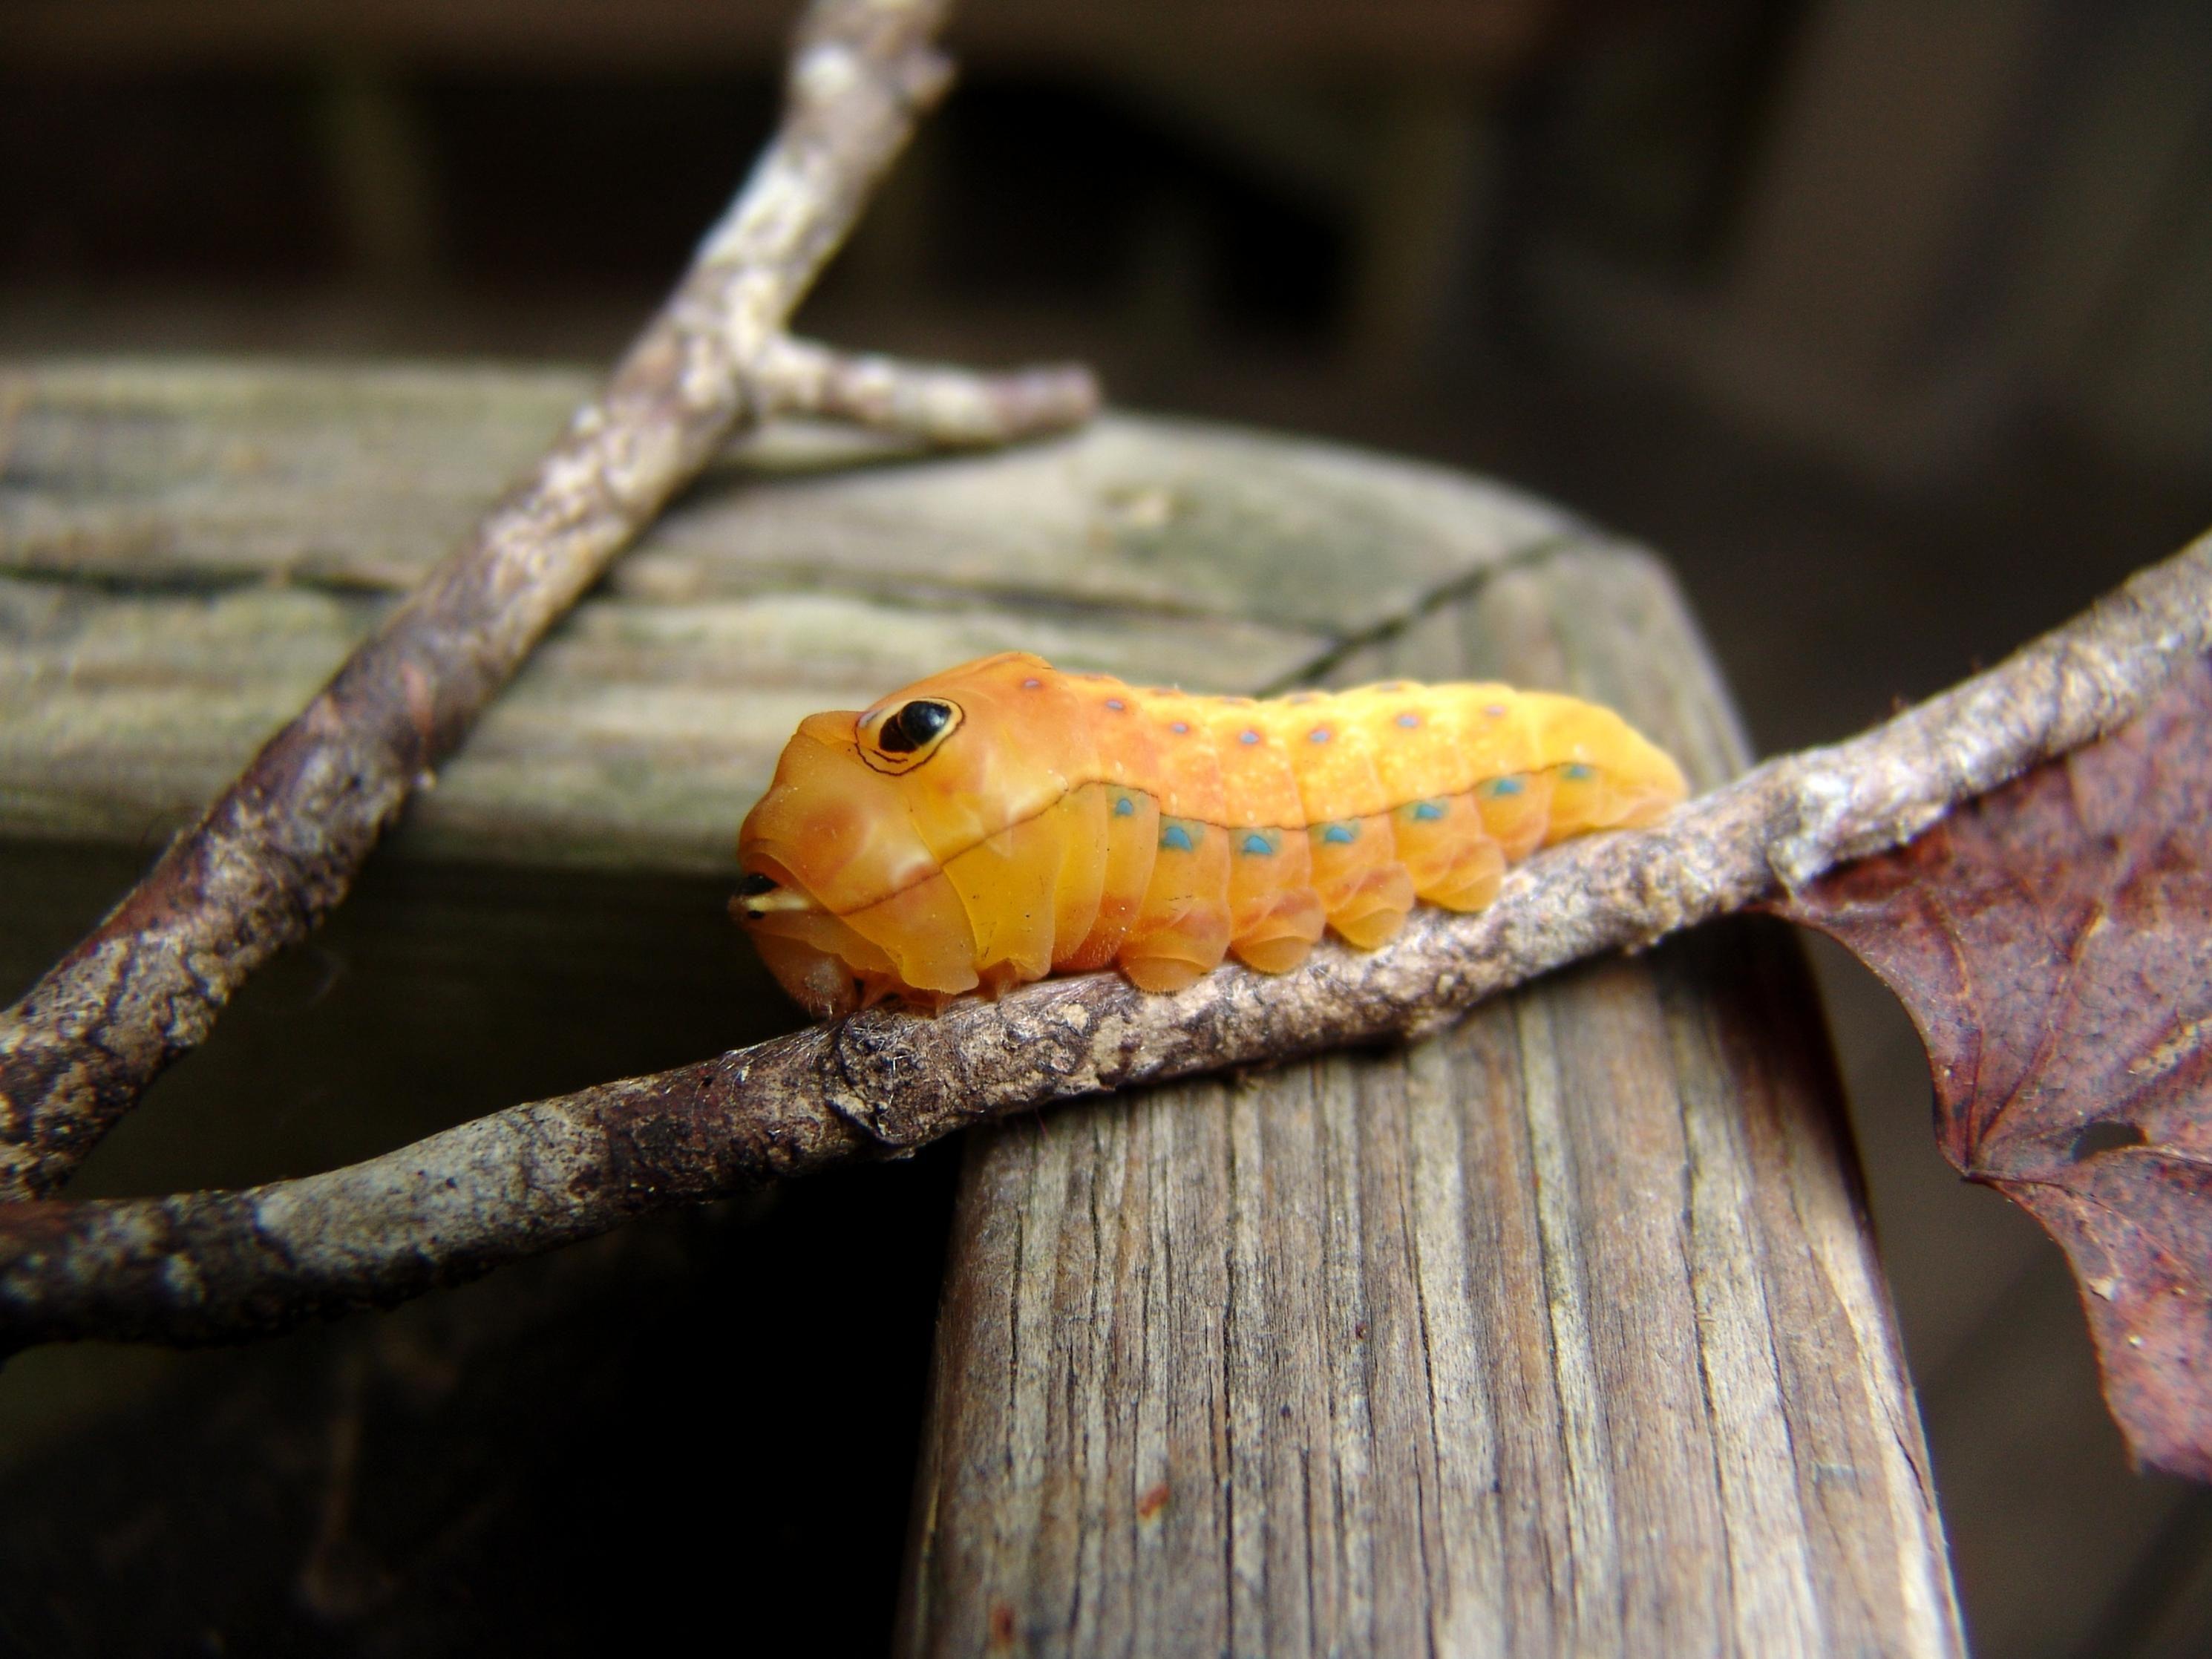 Free photograph; palamedes, caterpillar, branch